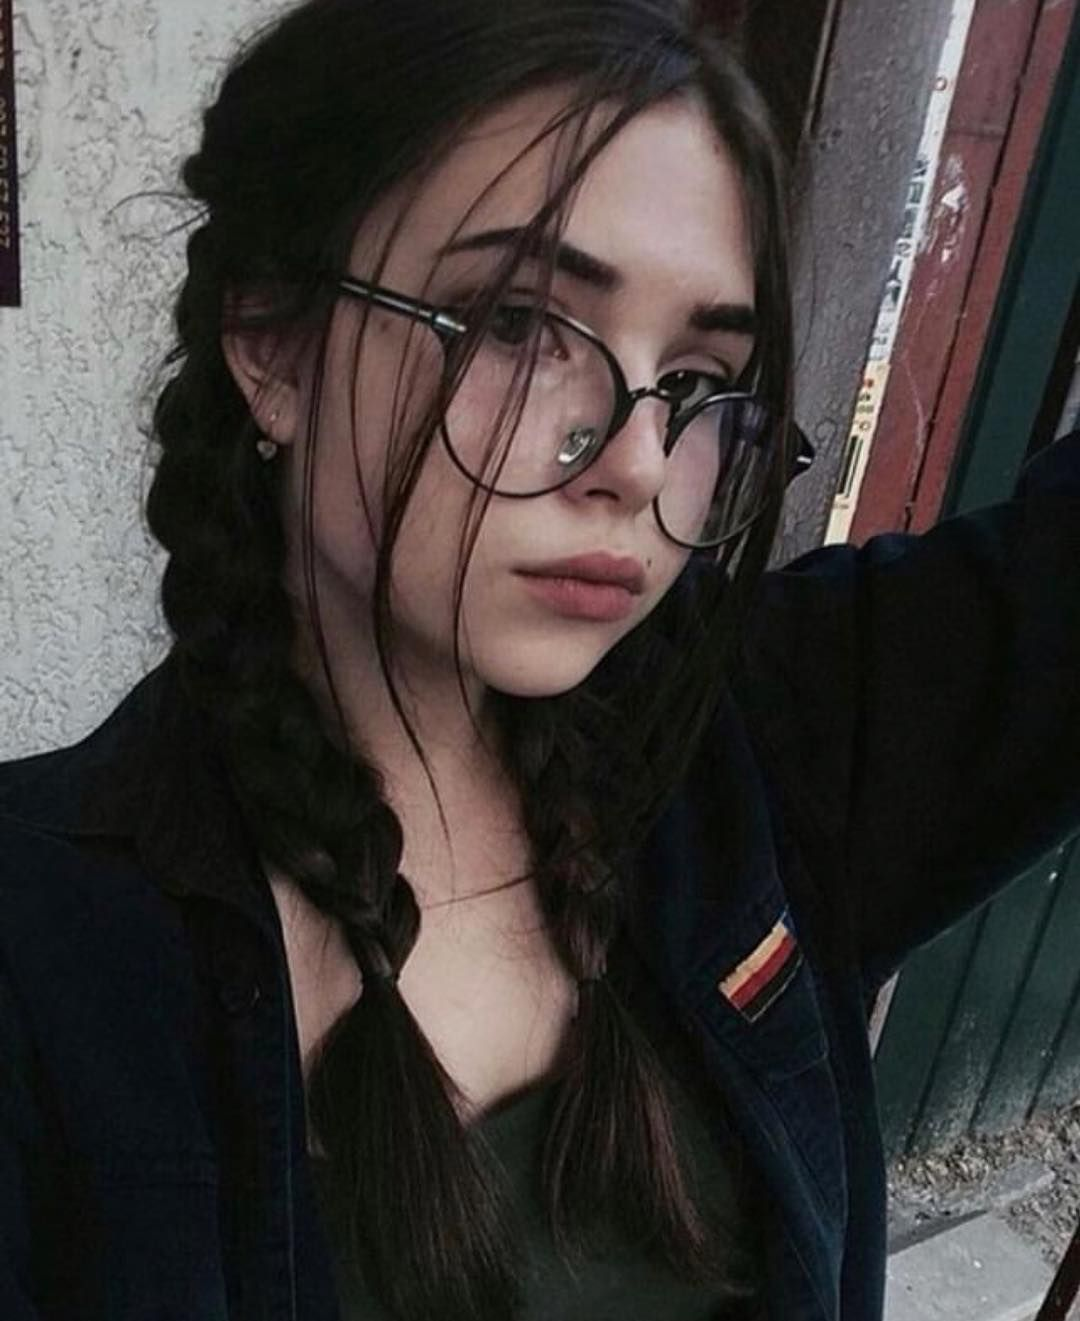 Cecile On Instagram Olesyaaaaa Beauty Grungeaesthetic Gir Girls With Black Hair Aesthetic Girl Grunge Girl